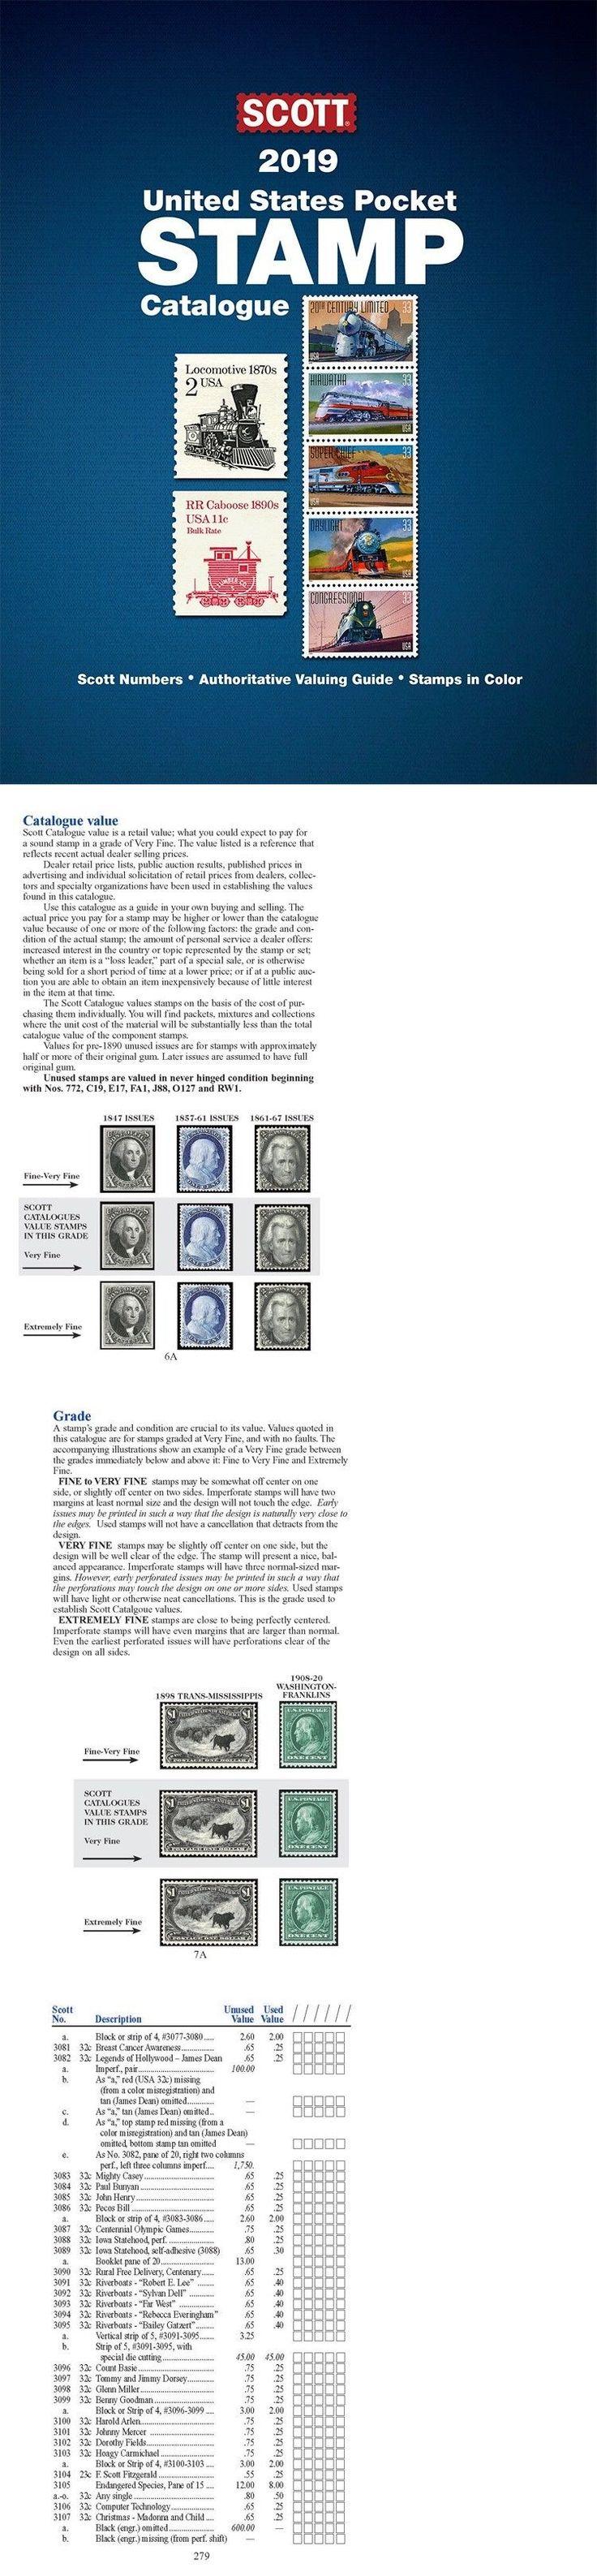 Details about new 2020 scott united states us pocket stamp